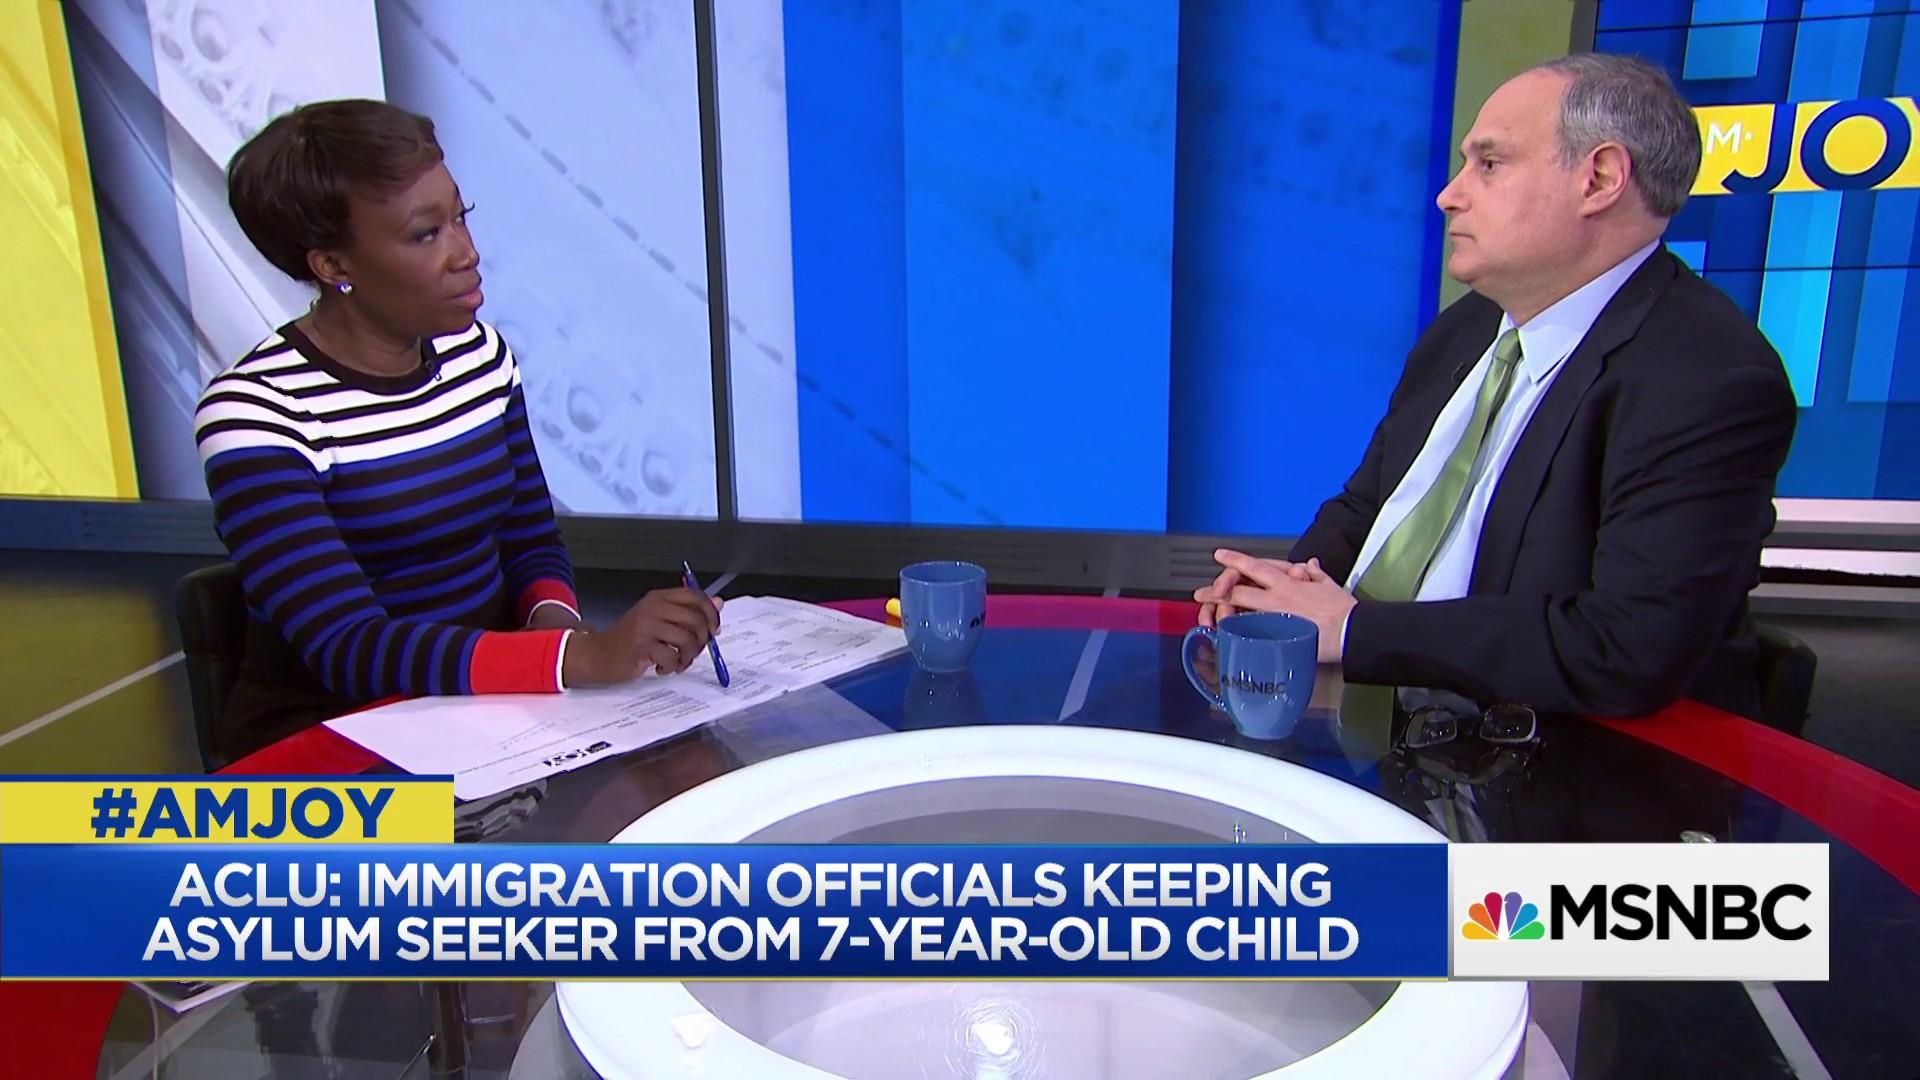 ACLU: Immigration officials split asylum seeker and child